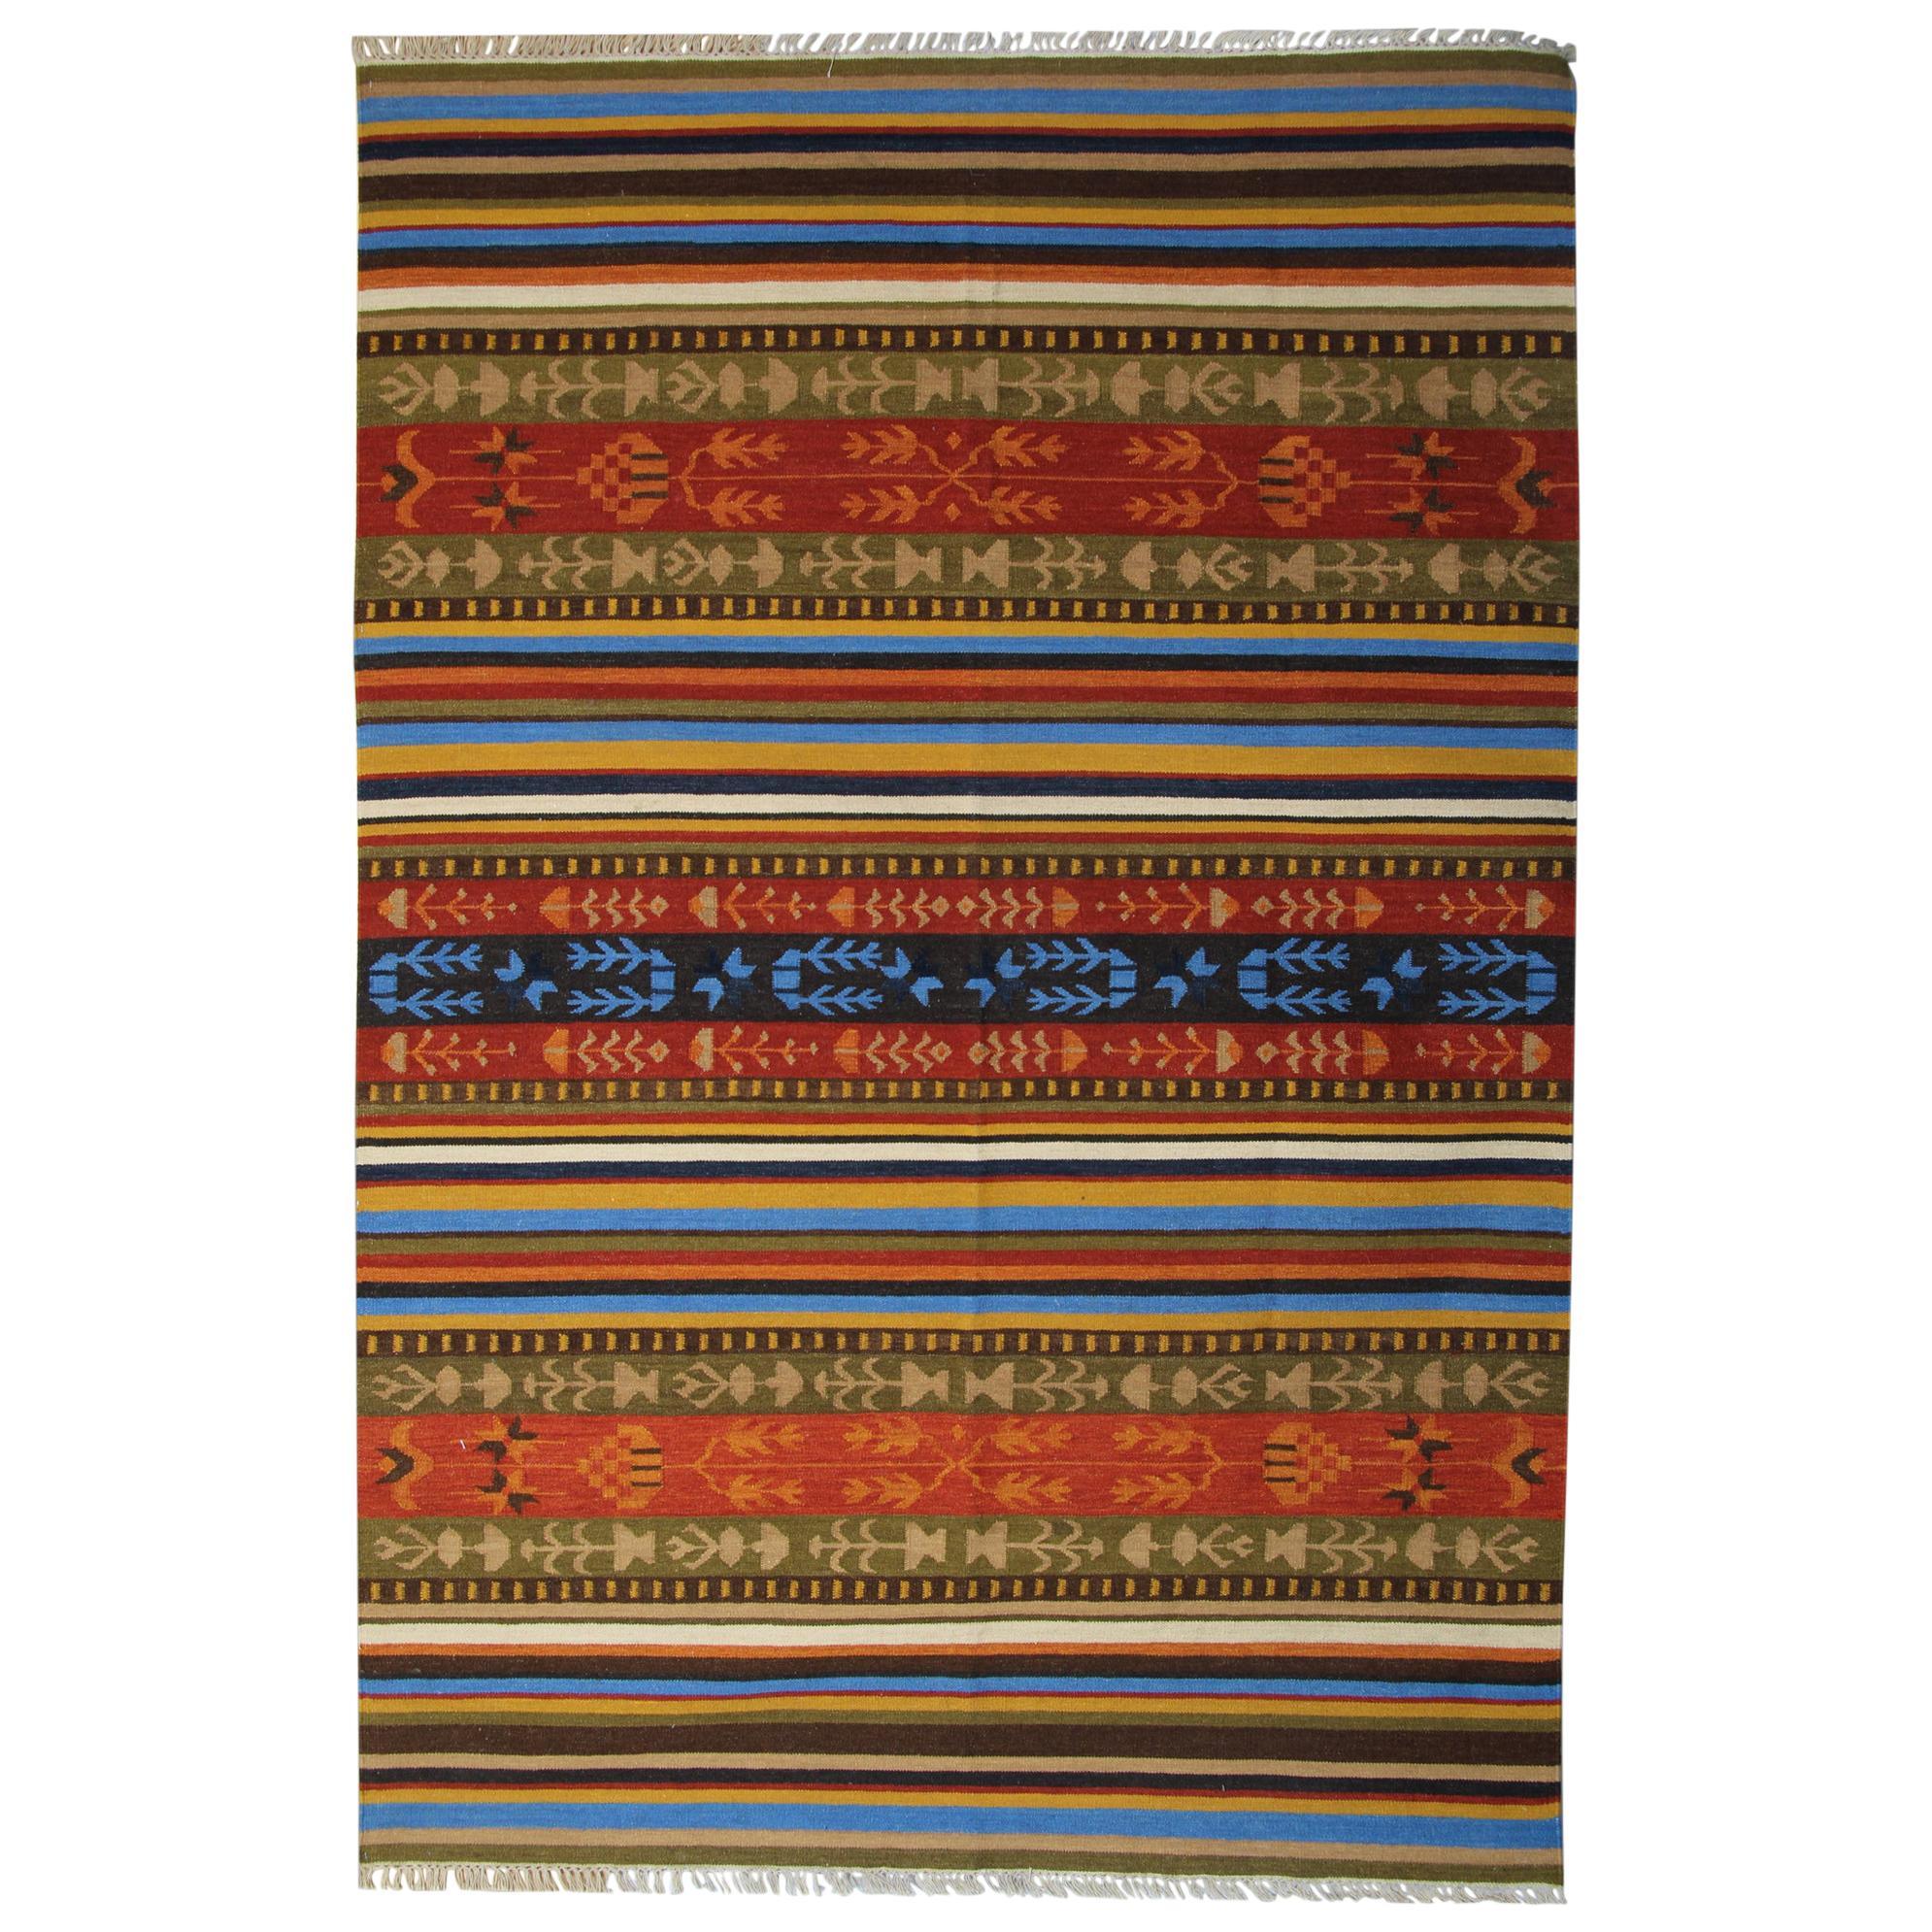 Modern Striped Kilim Rug, Handmade Geometric Carpet Kilim Area Rug